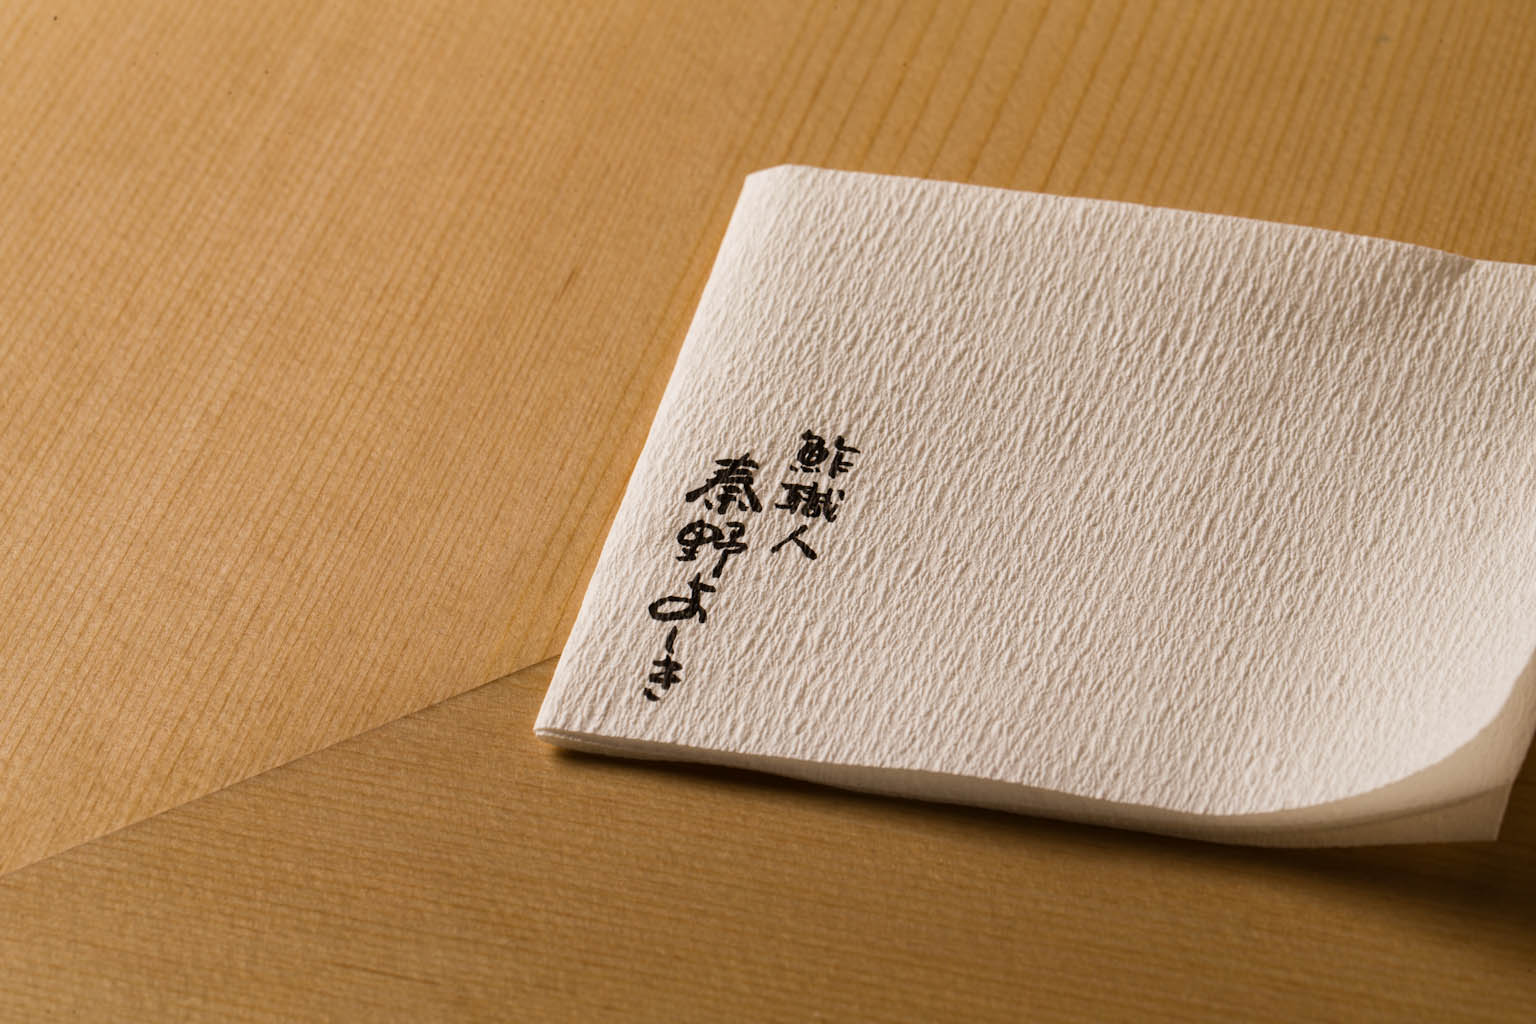 Hatano Yoshiki cuisine #1